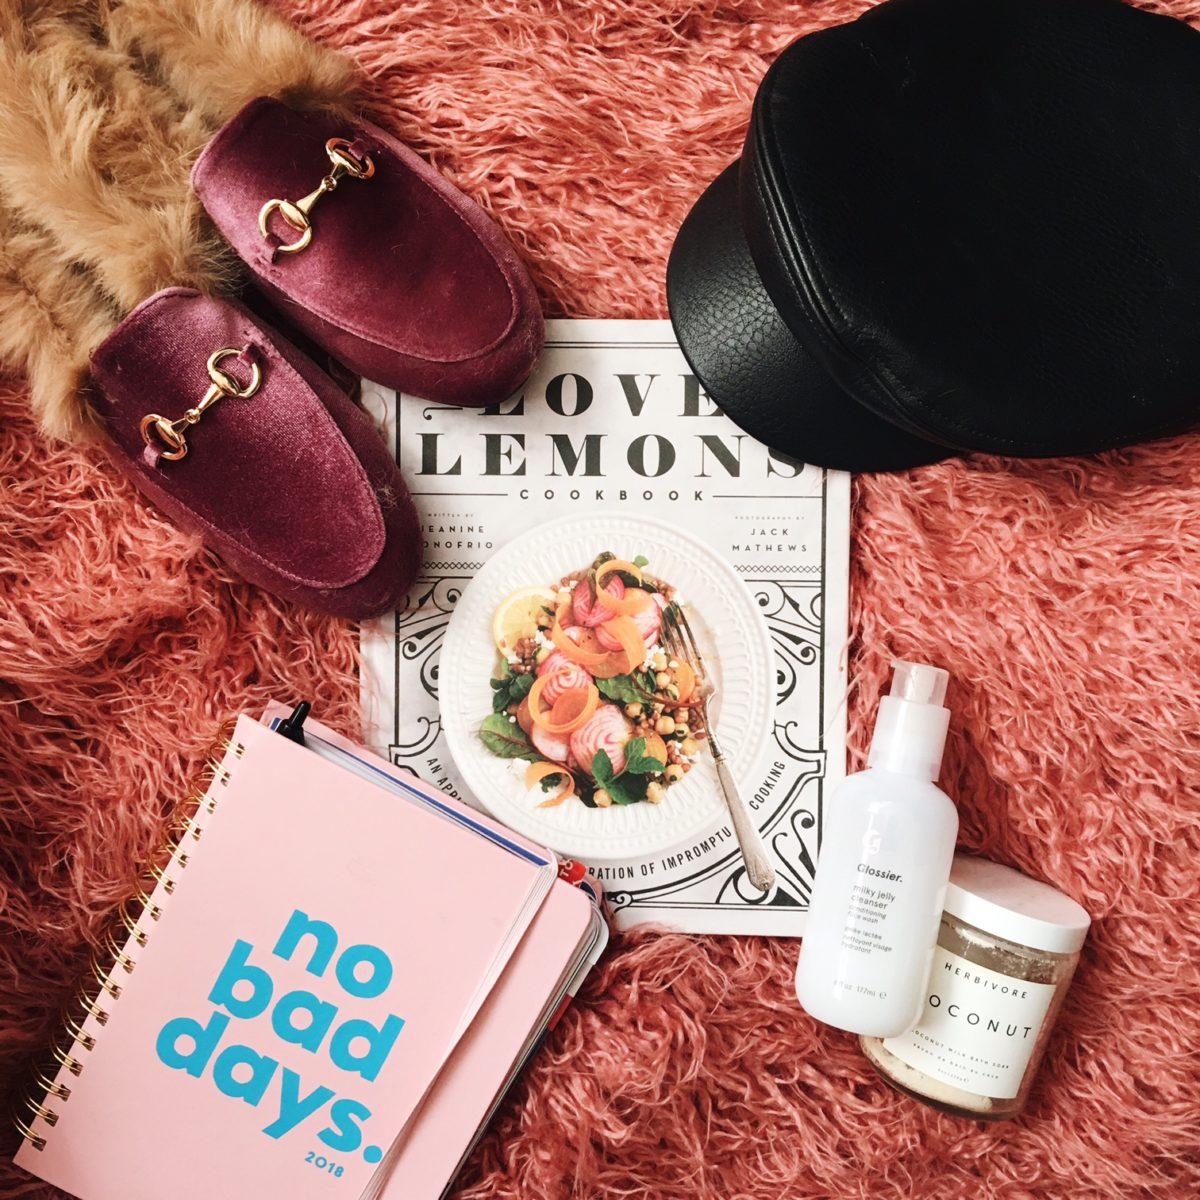 My Favorite Things of 2017- BloggerNotBillionaire